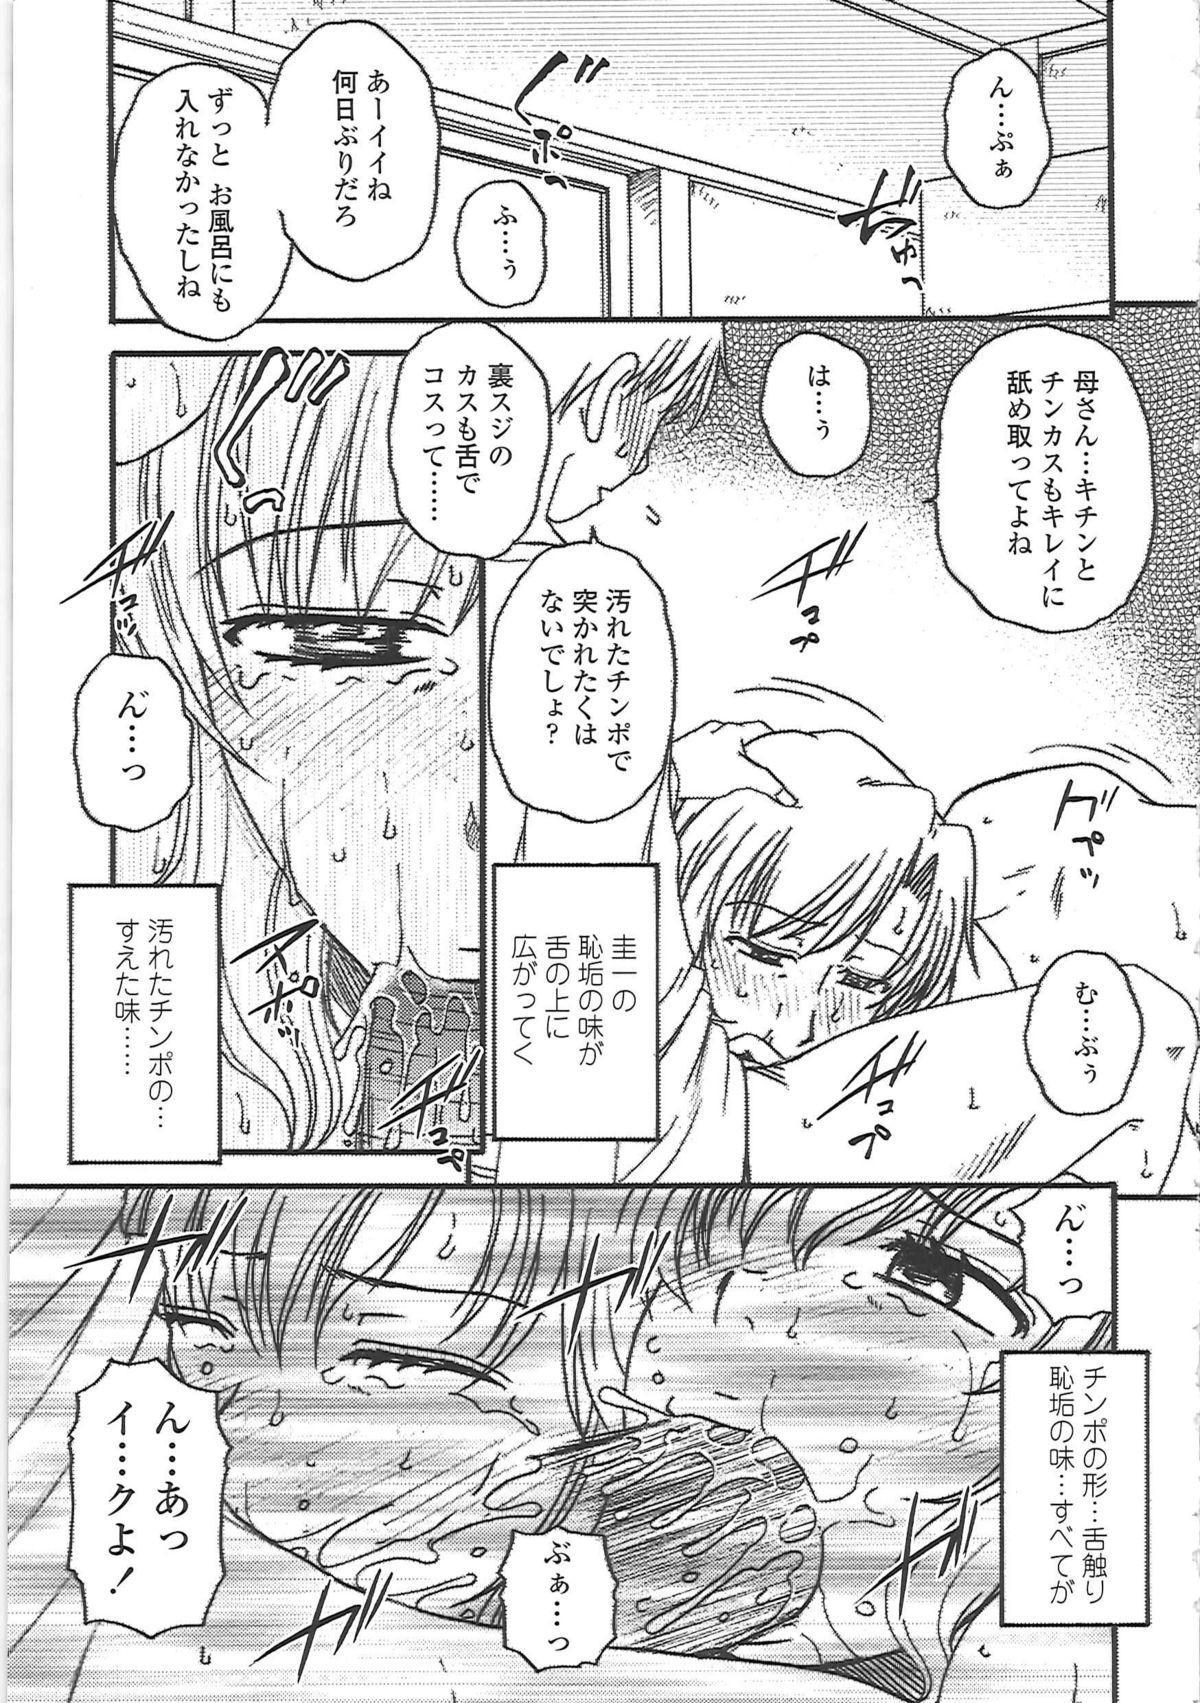 Nikuzuma Tsuushin - Erotic Wife Communication 181